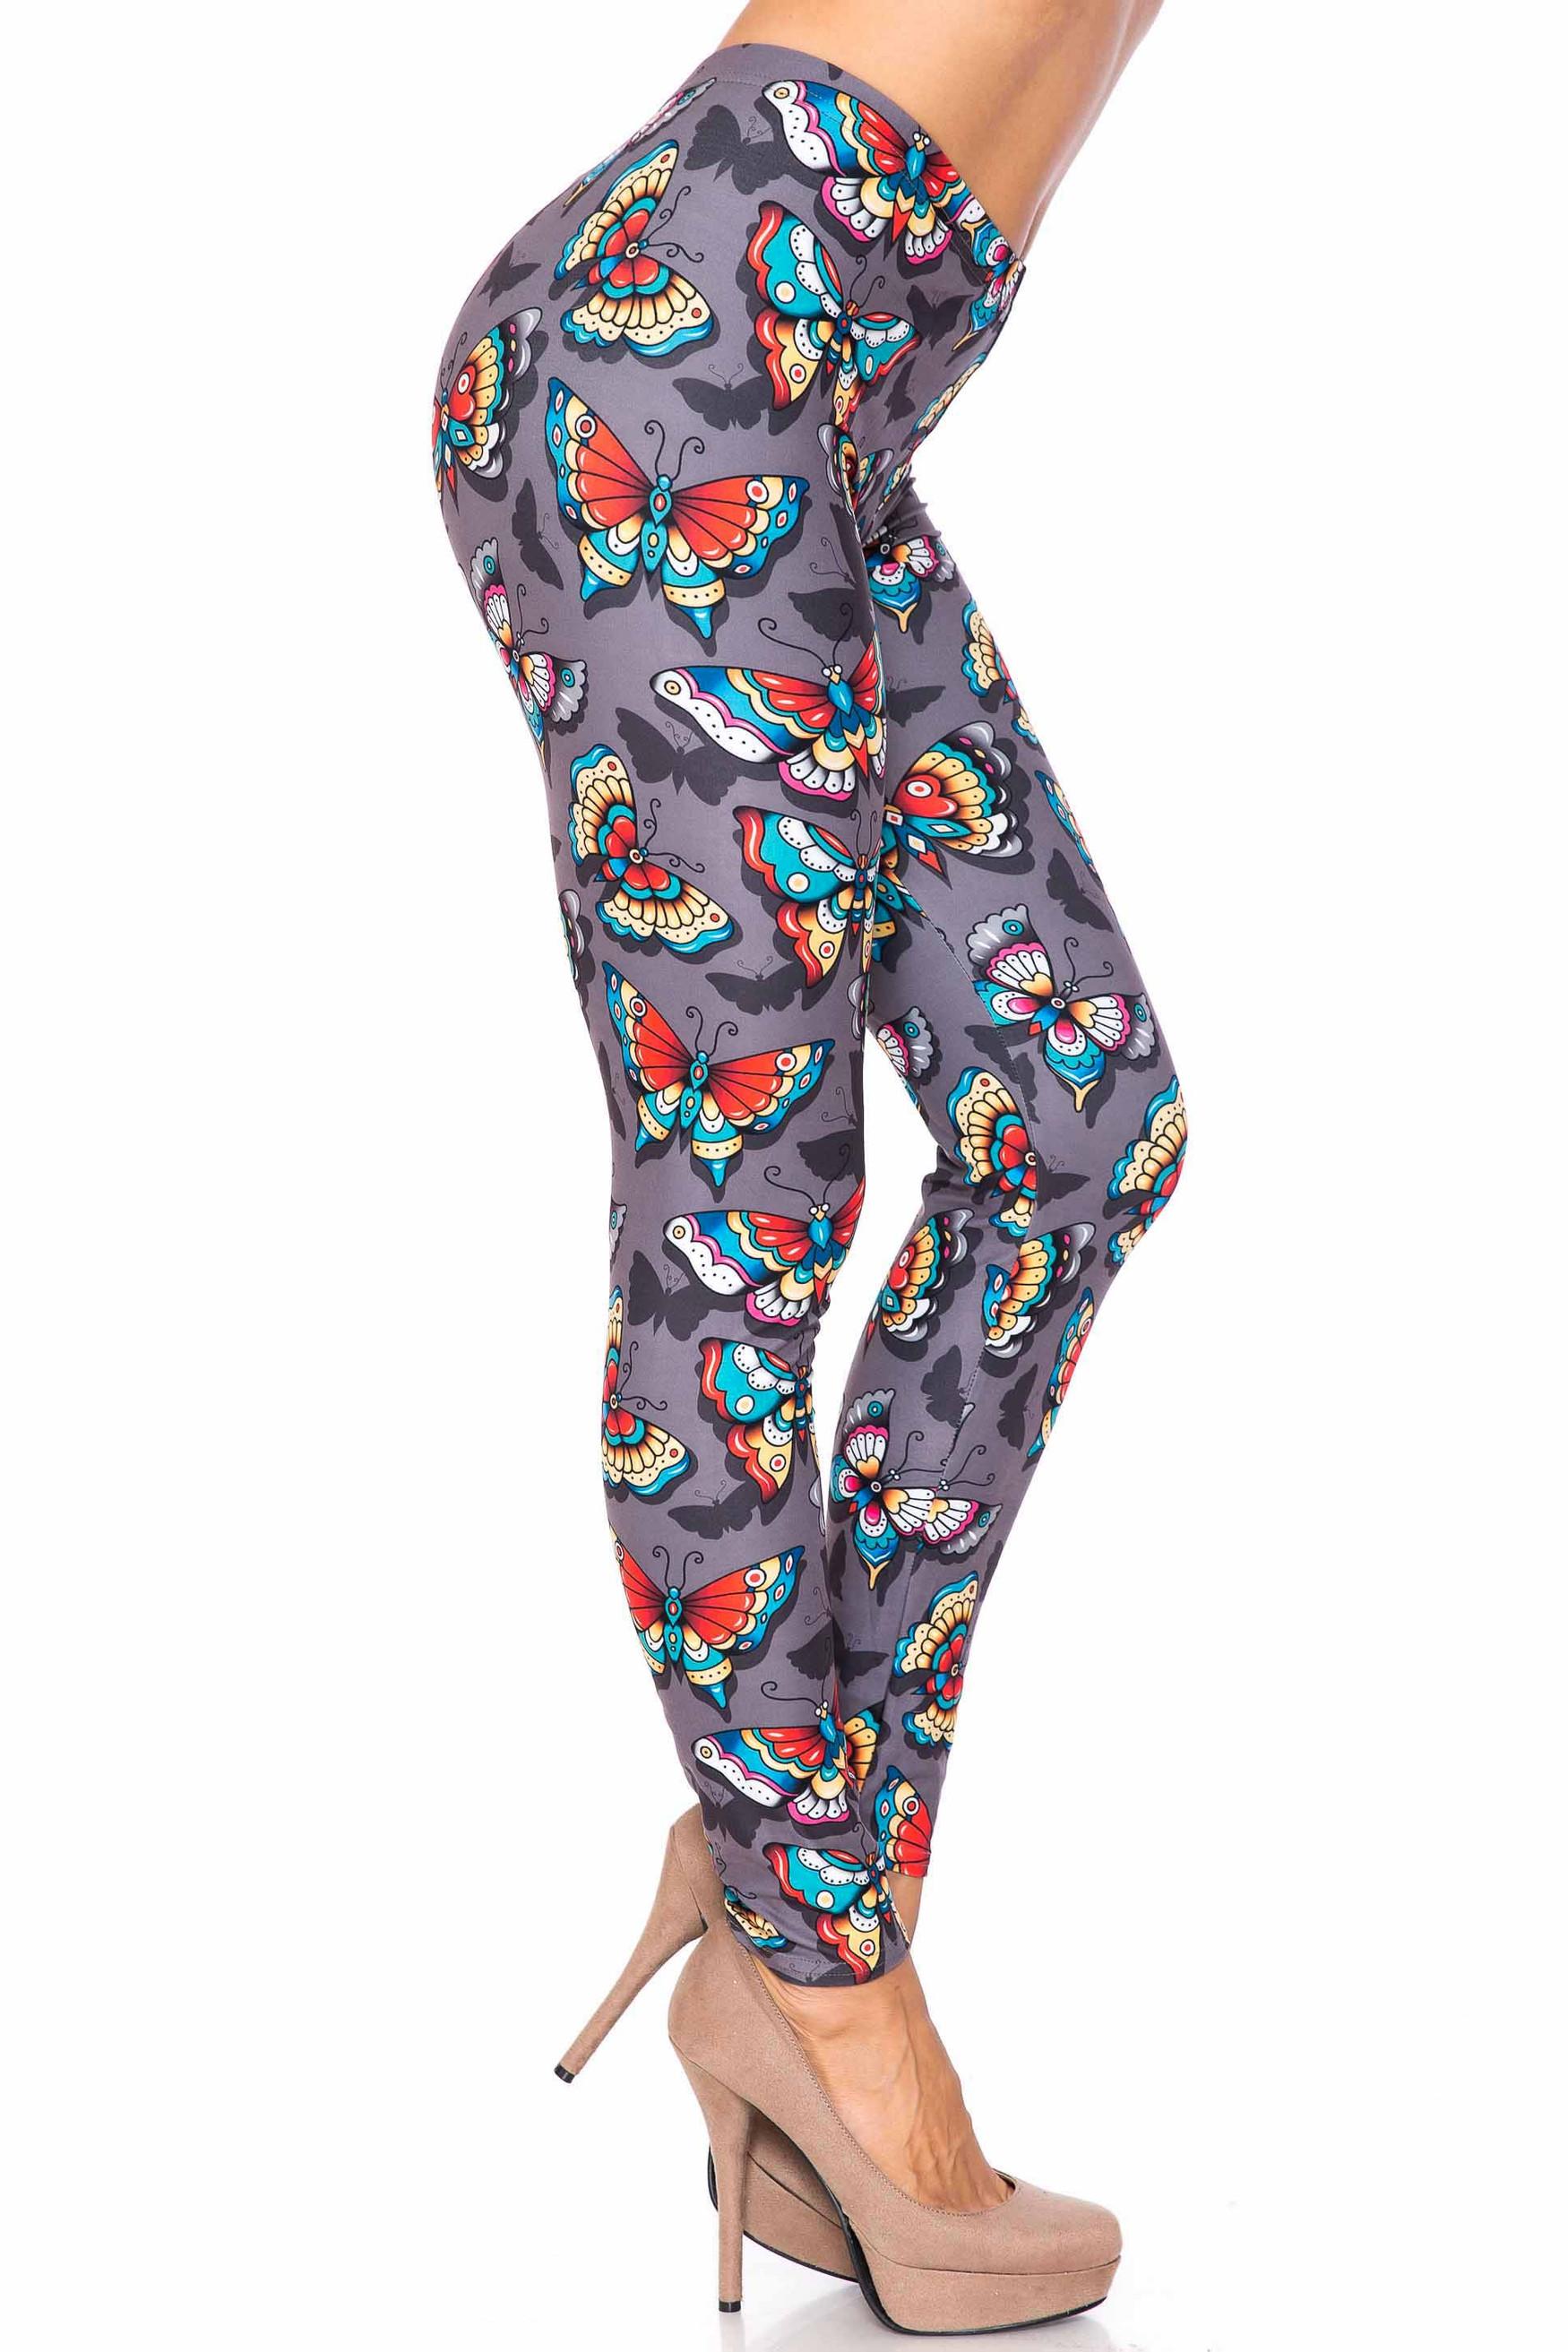 Creamy Soft Jewel Tone Butterfly Extra Plus Size Leggings - 3X-5X - USA Fashion™